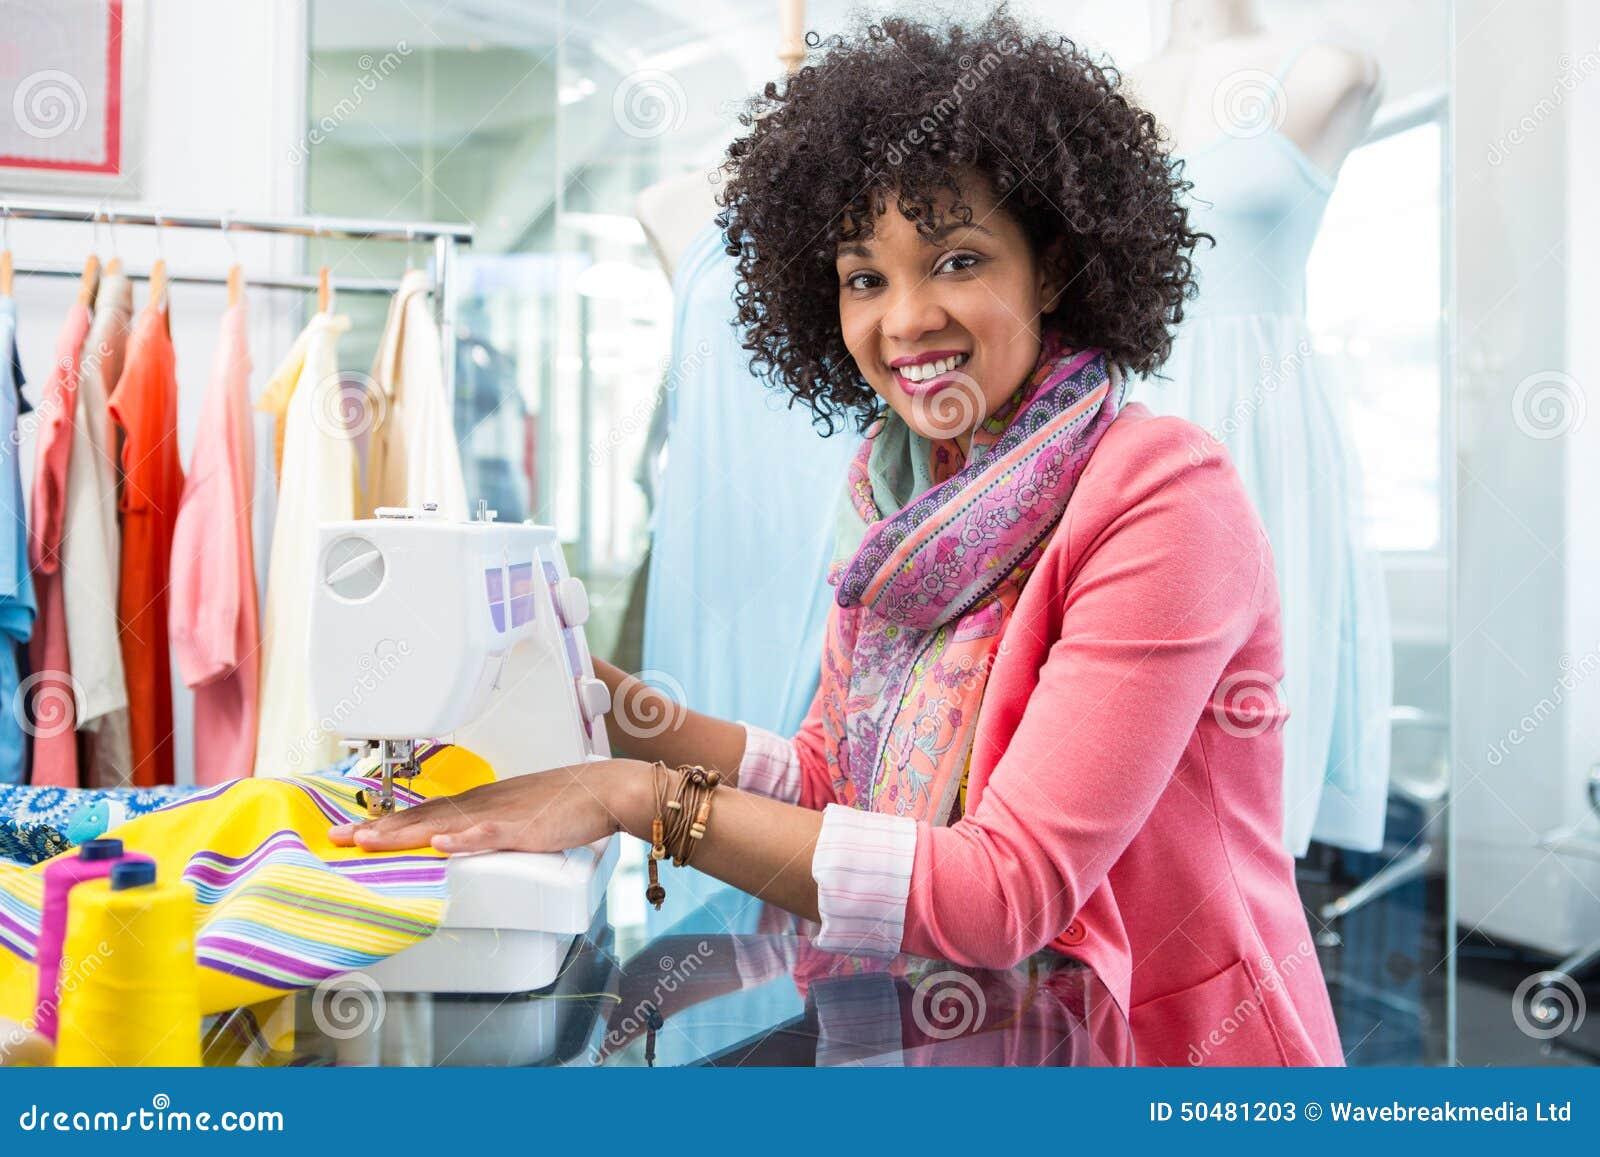 Female Fashion Designer Using Sewing Machine Stock Photo ...